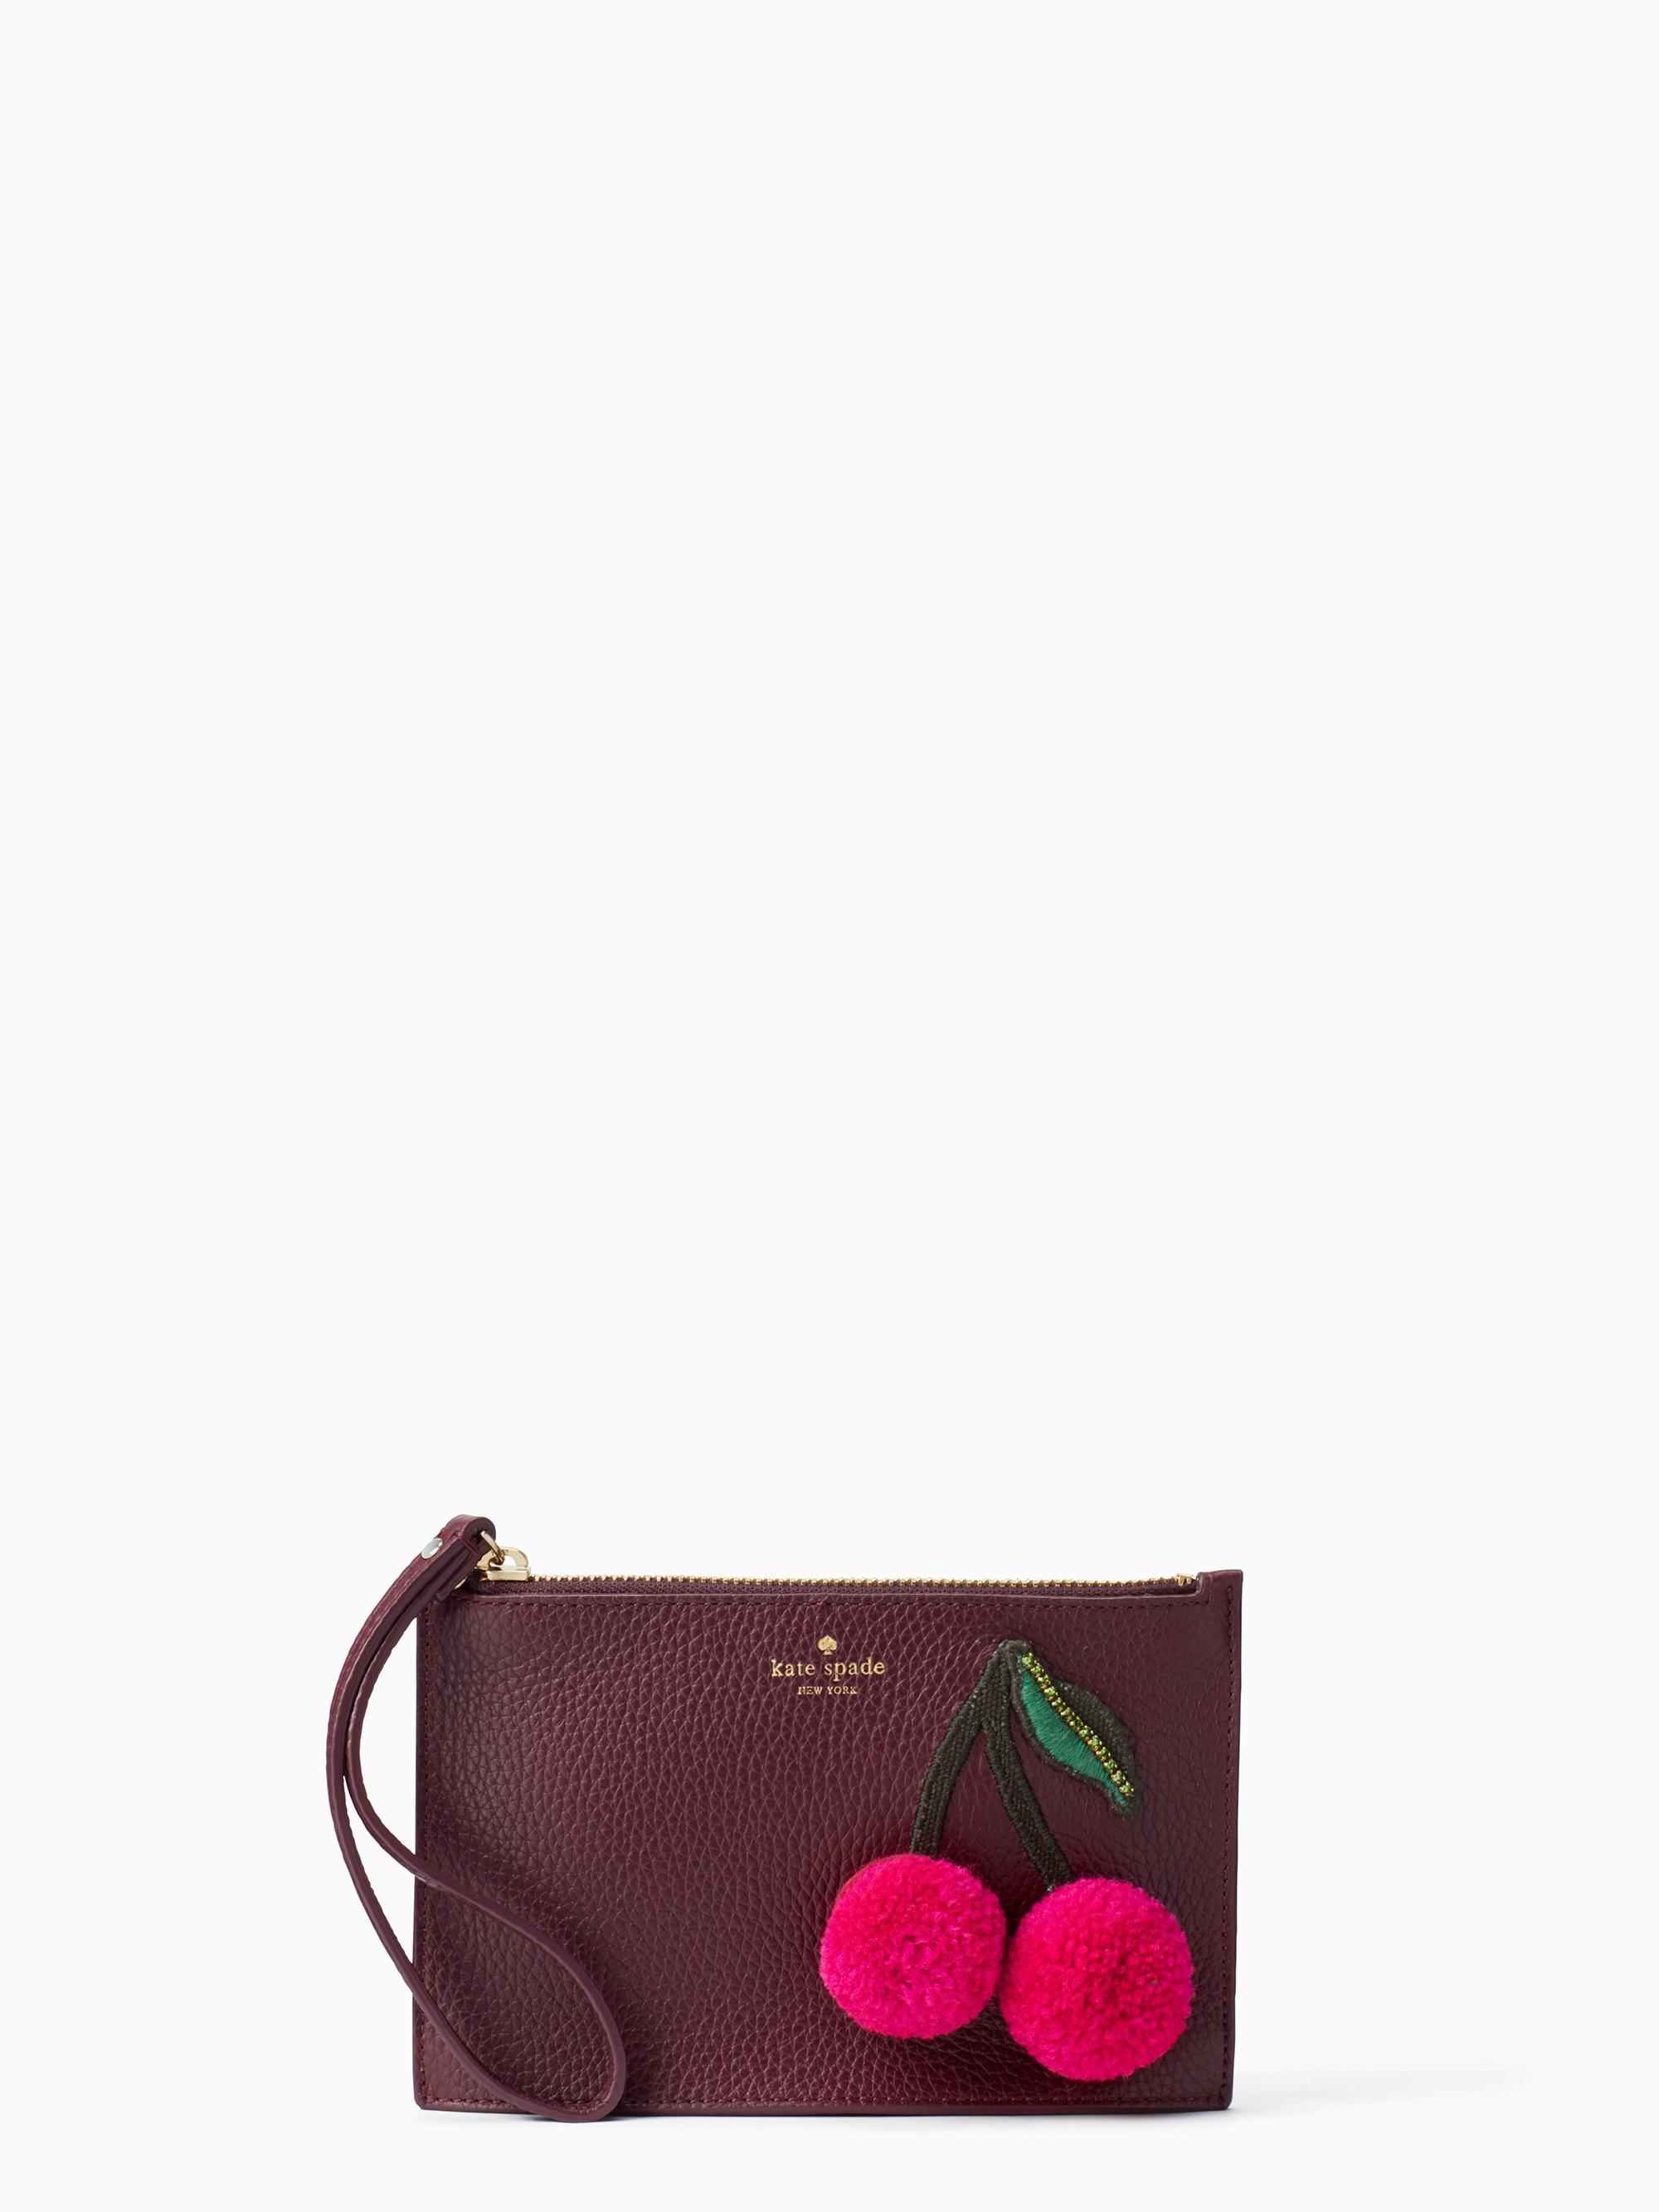 Kate Spade On Purpose Cherry Applique Mini Leather Wristlet In Deep Plum